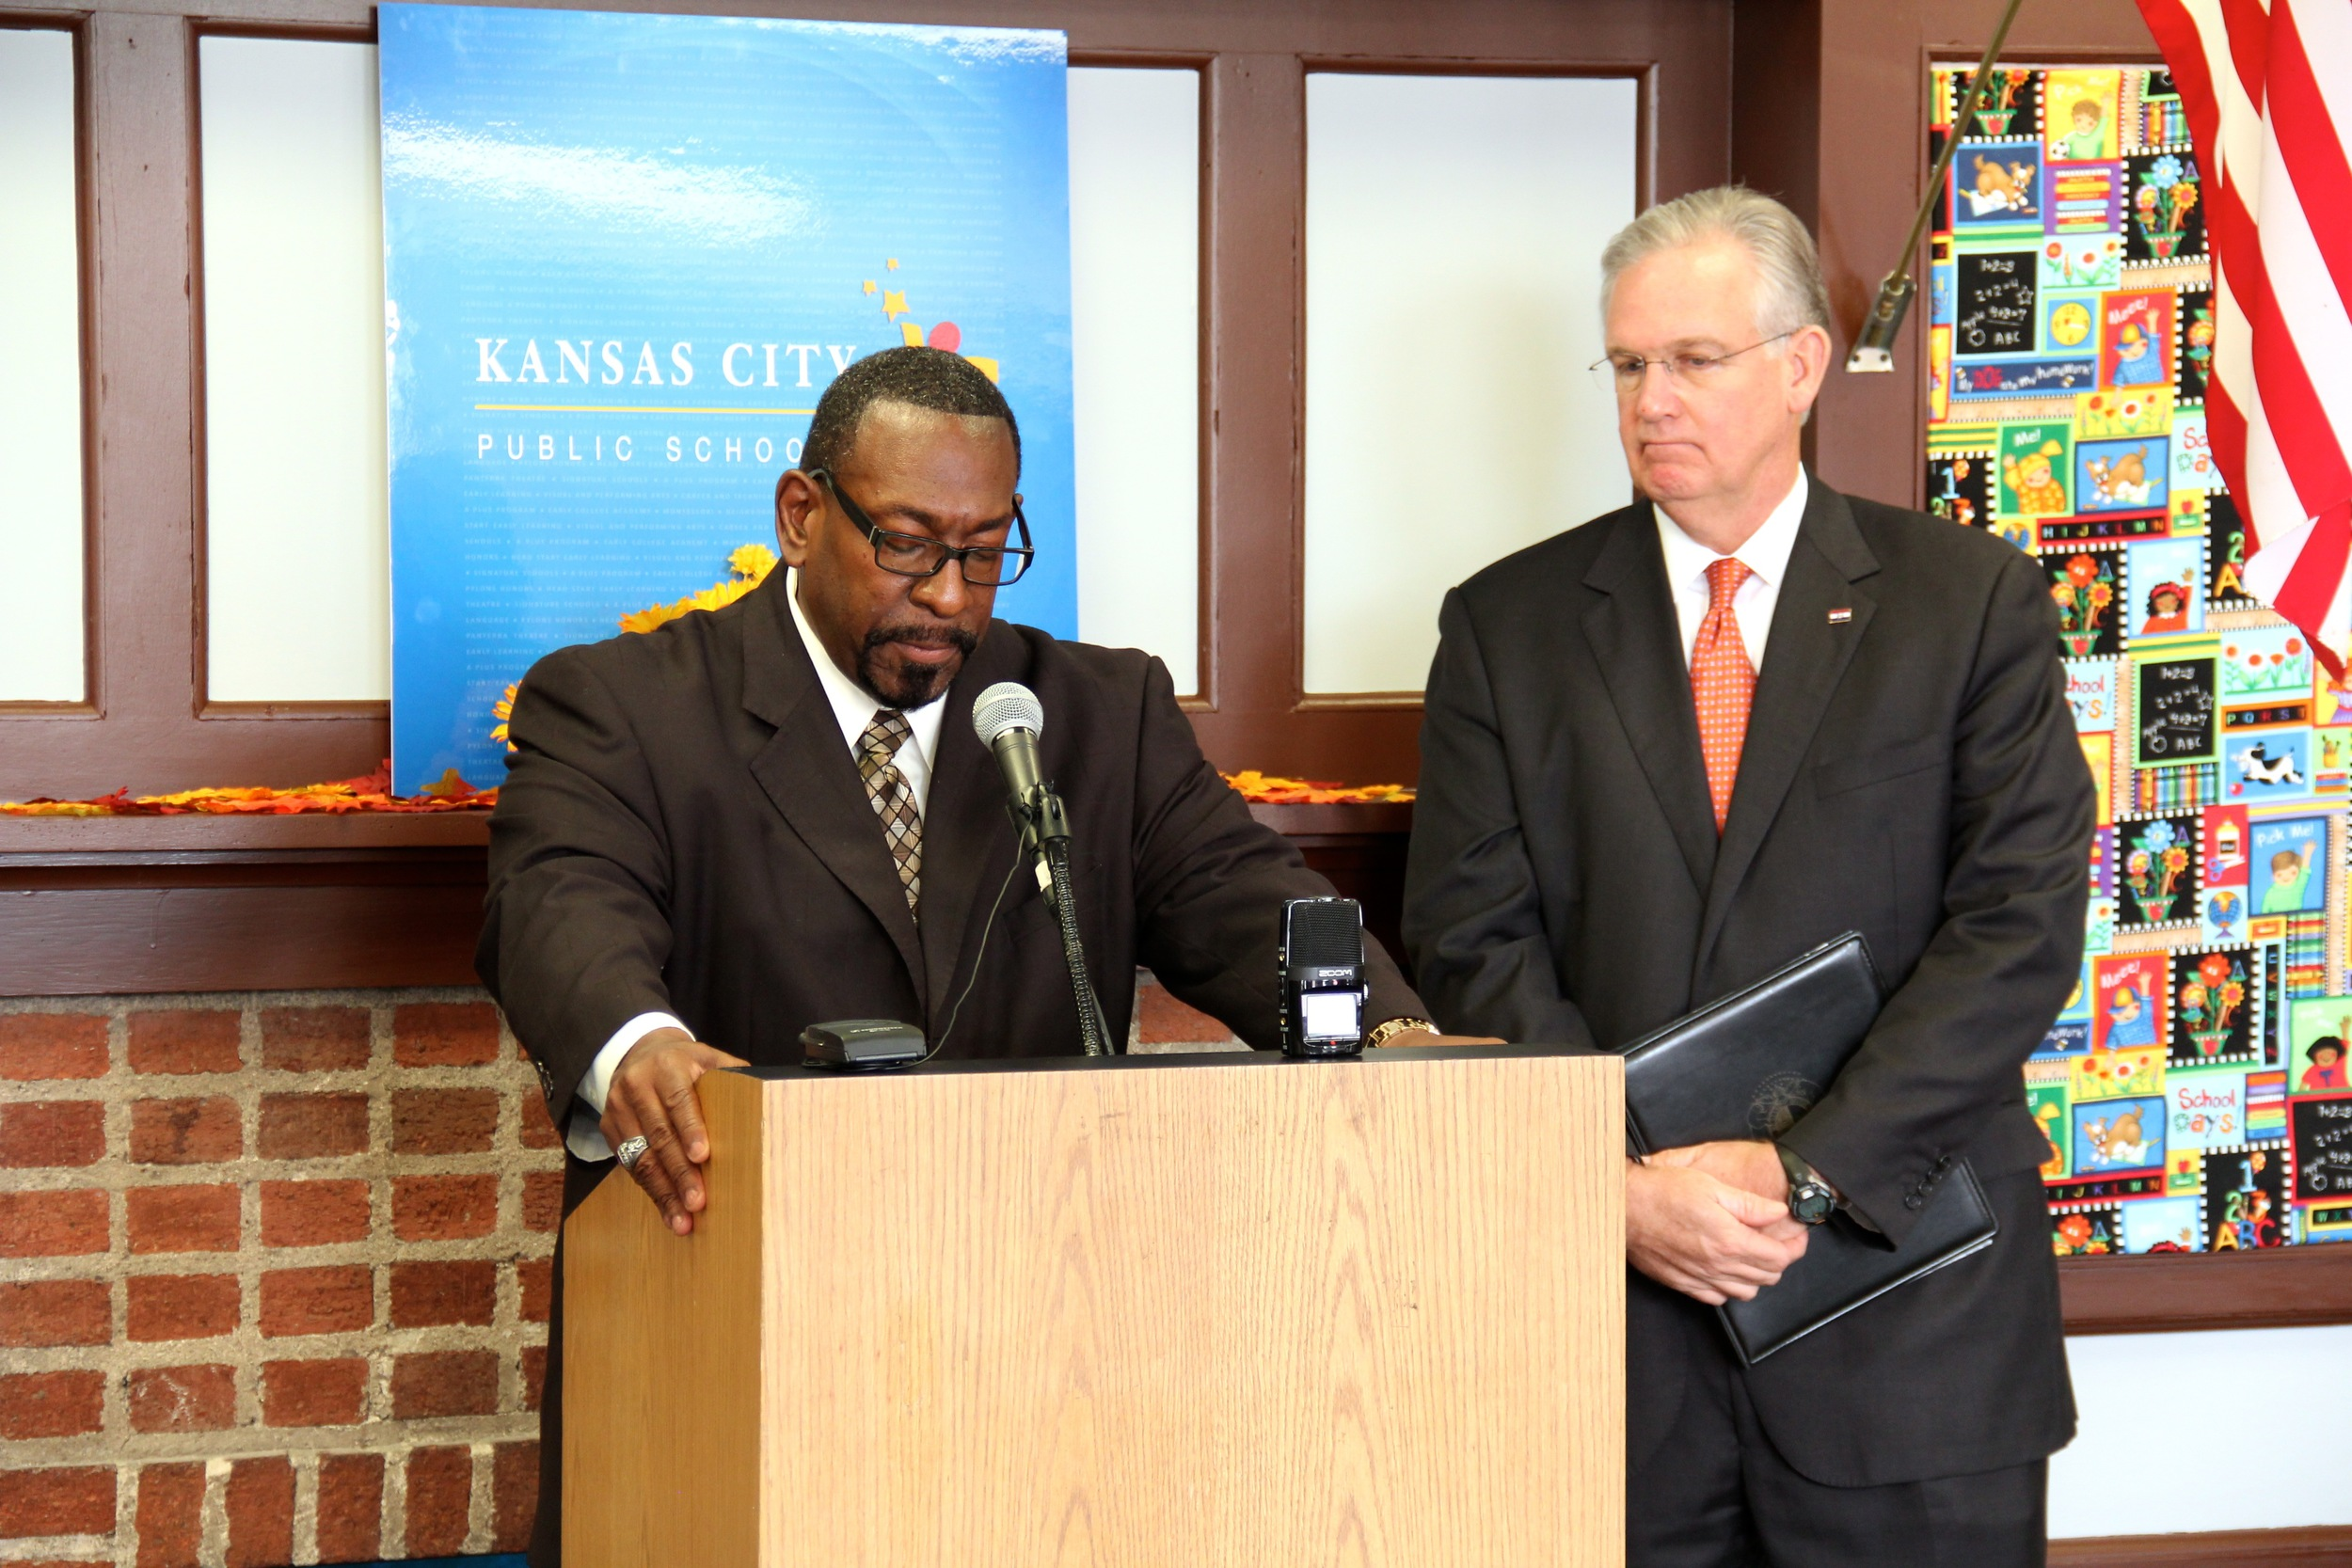 Kansas City Public School Supt. R. Stephen Green and Gov. Jay Nixon.